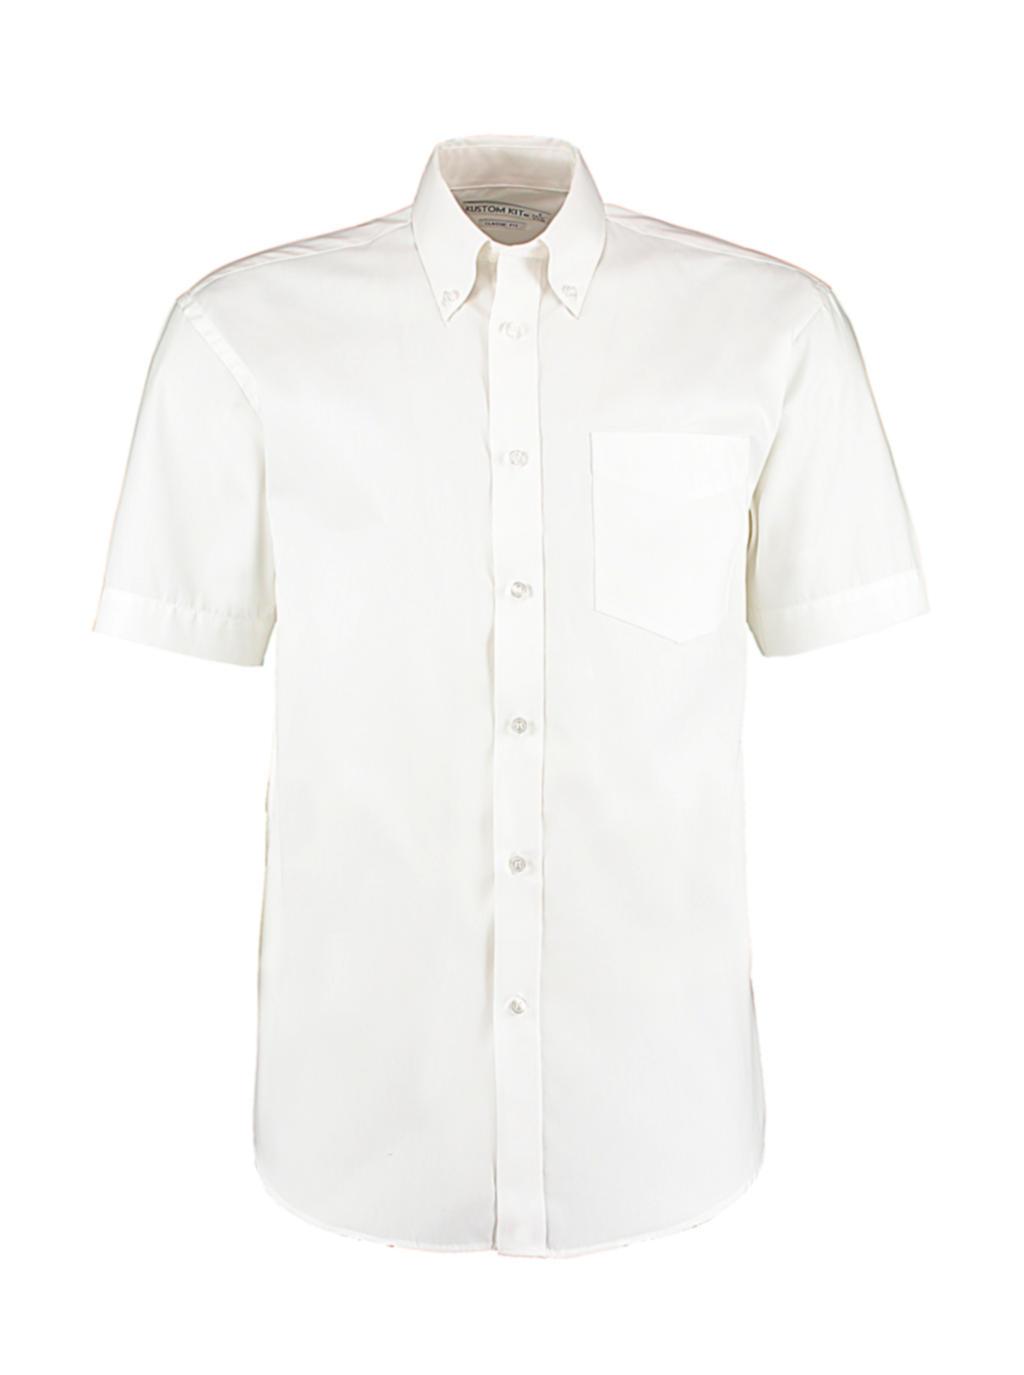 Classic Fit Premium Oxford Shirt SSL